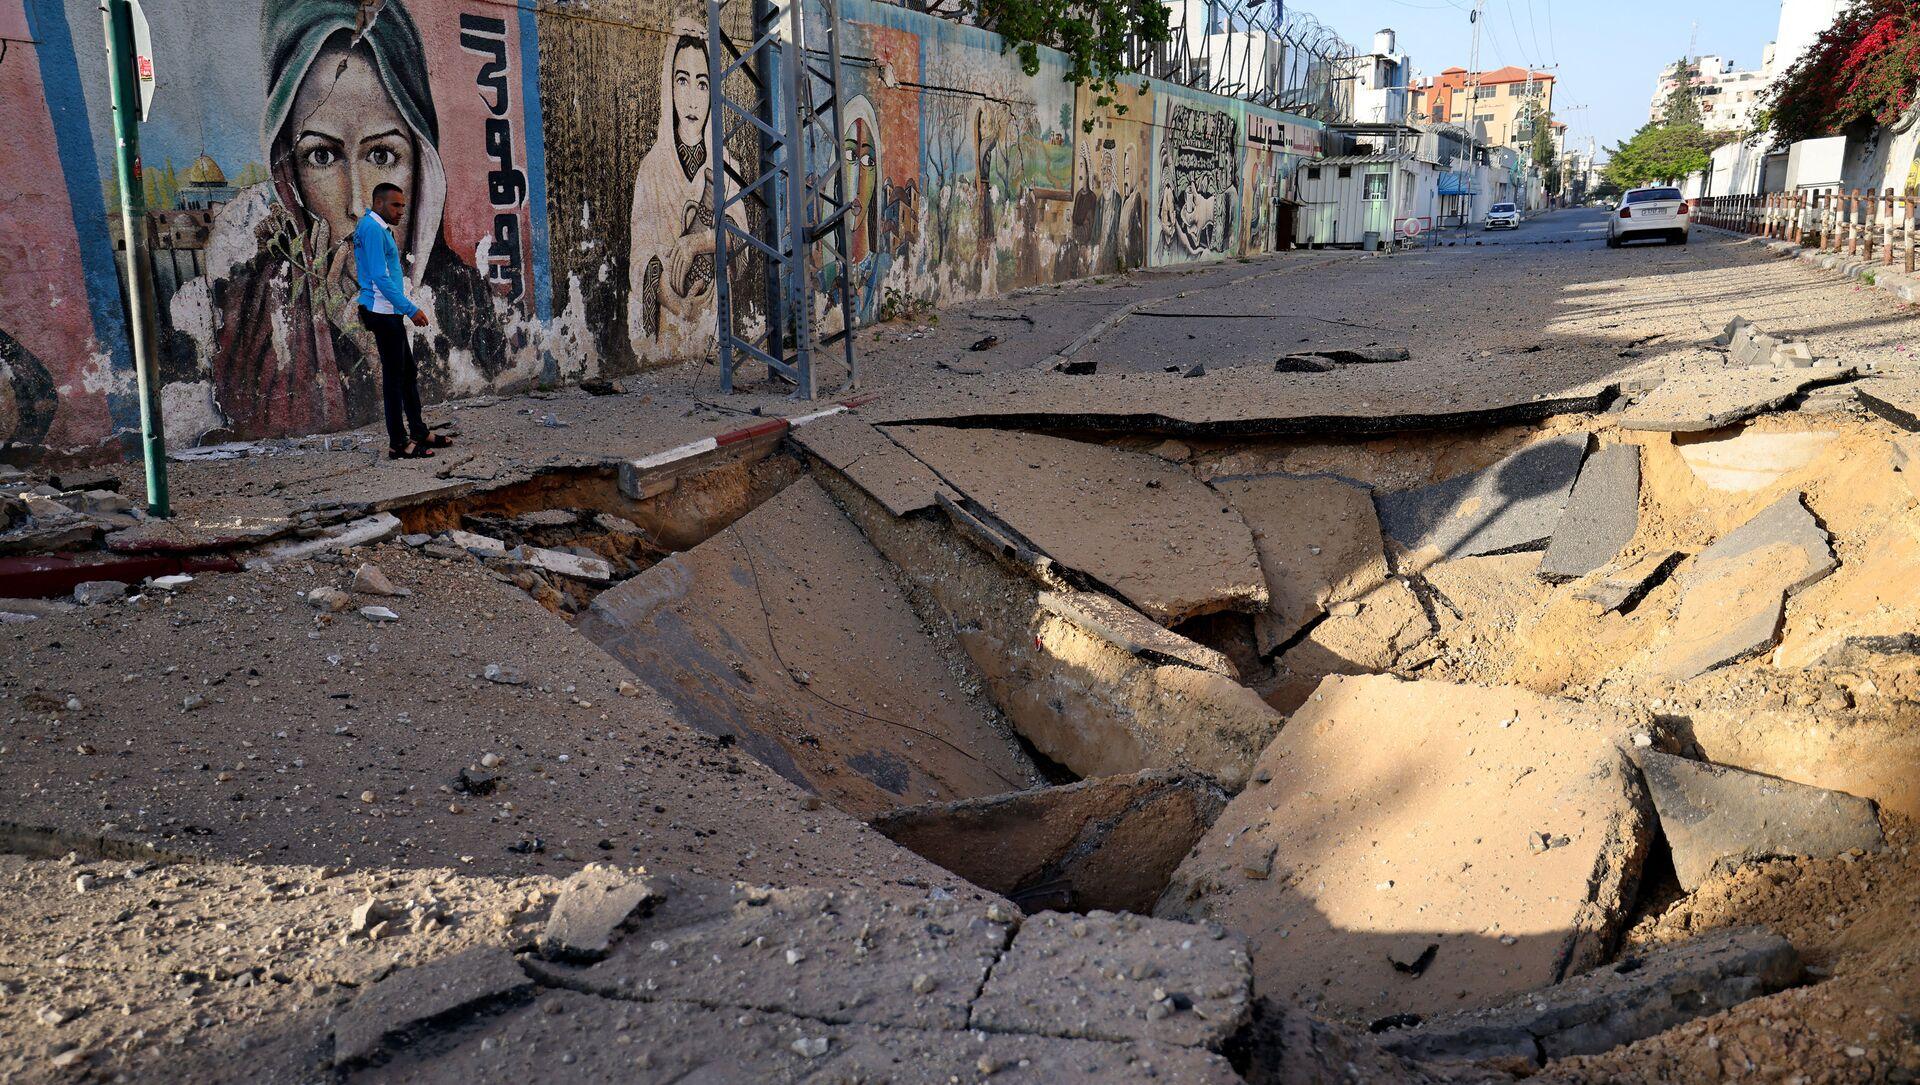 Una strada colpita da un razzo a Gaza - Sputnik Italia, 1920, 12.05.2021